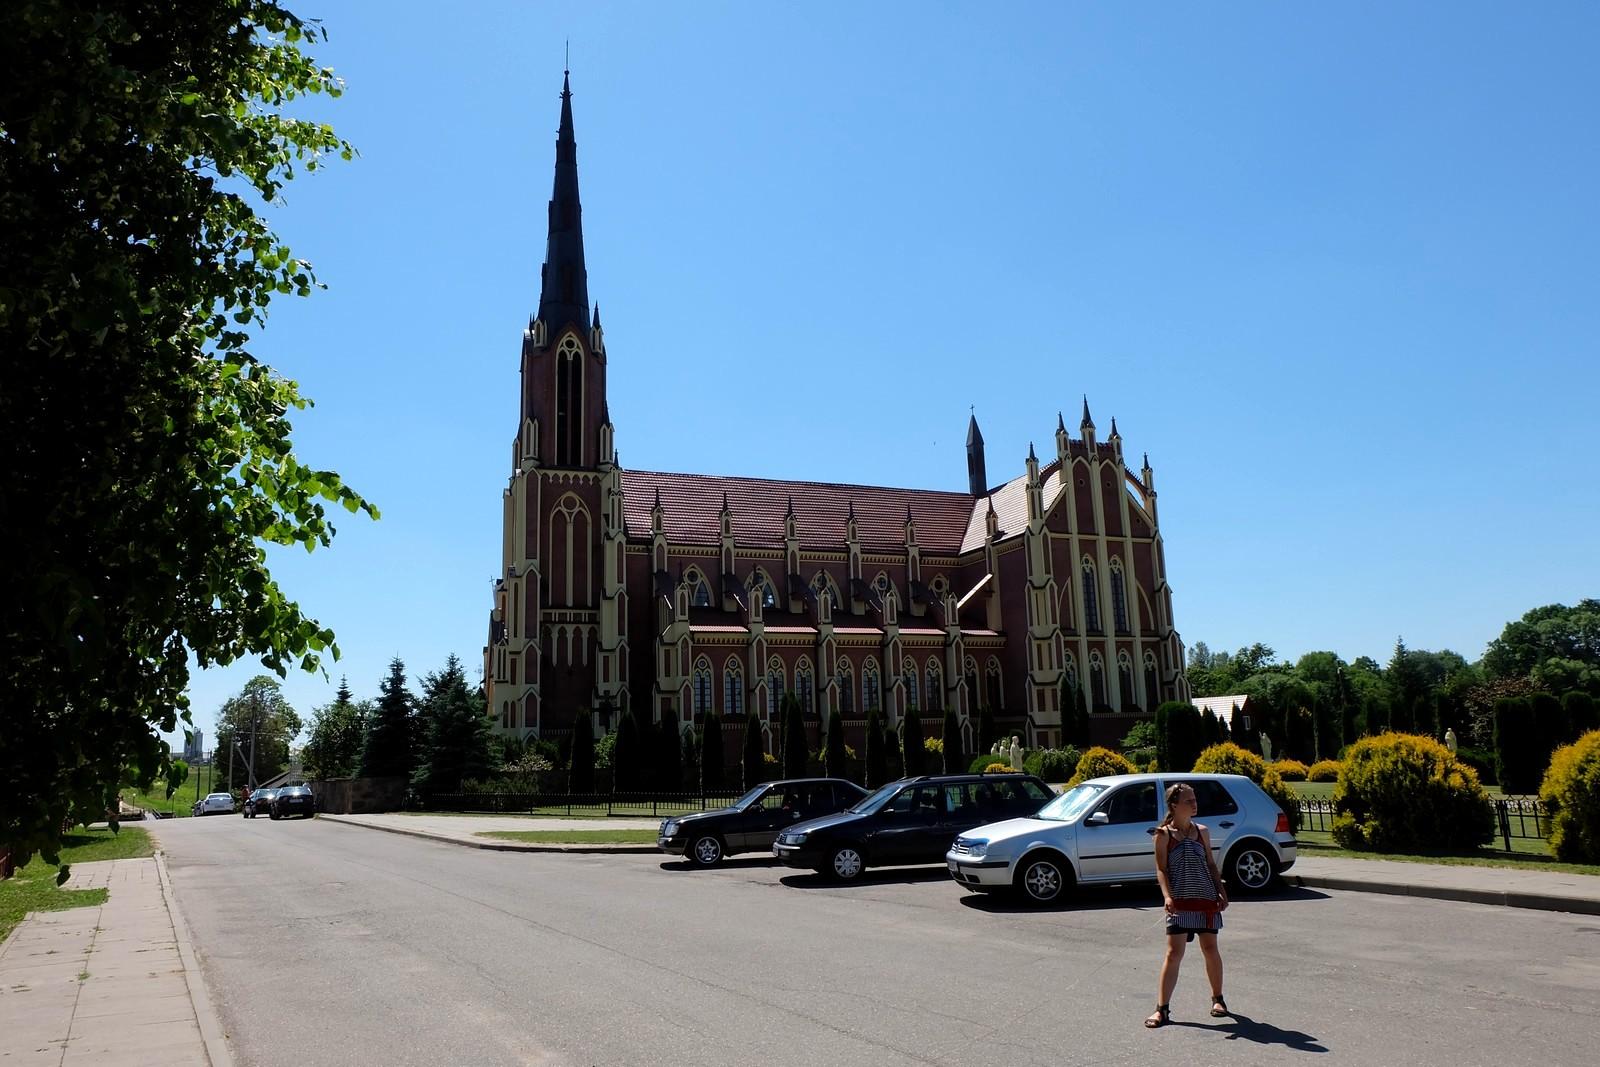 Свято-Троицкий костёл, Гервяты, Беларусь